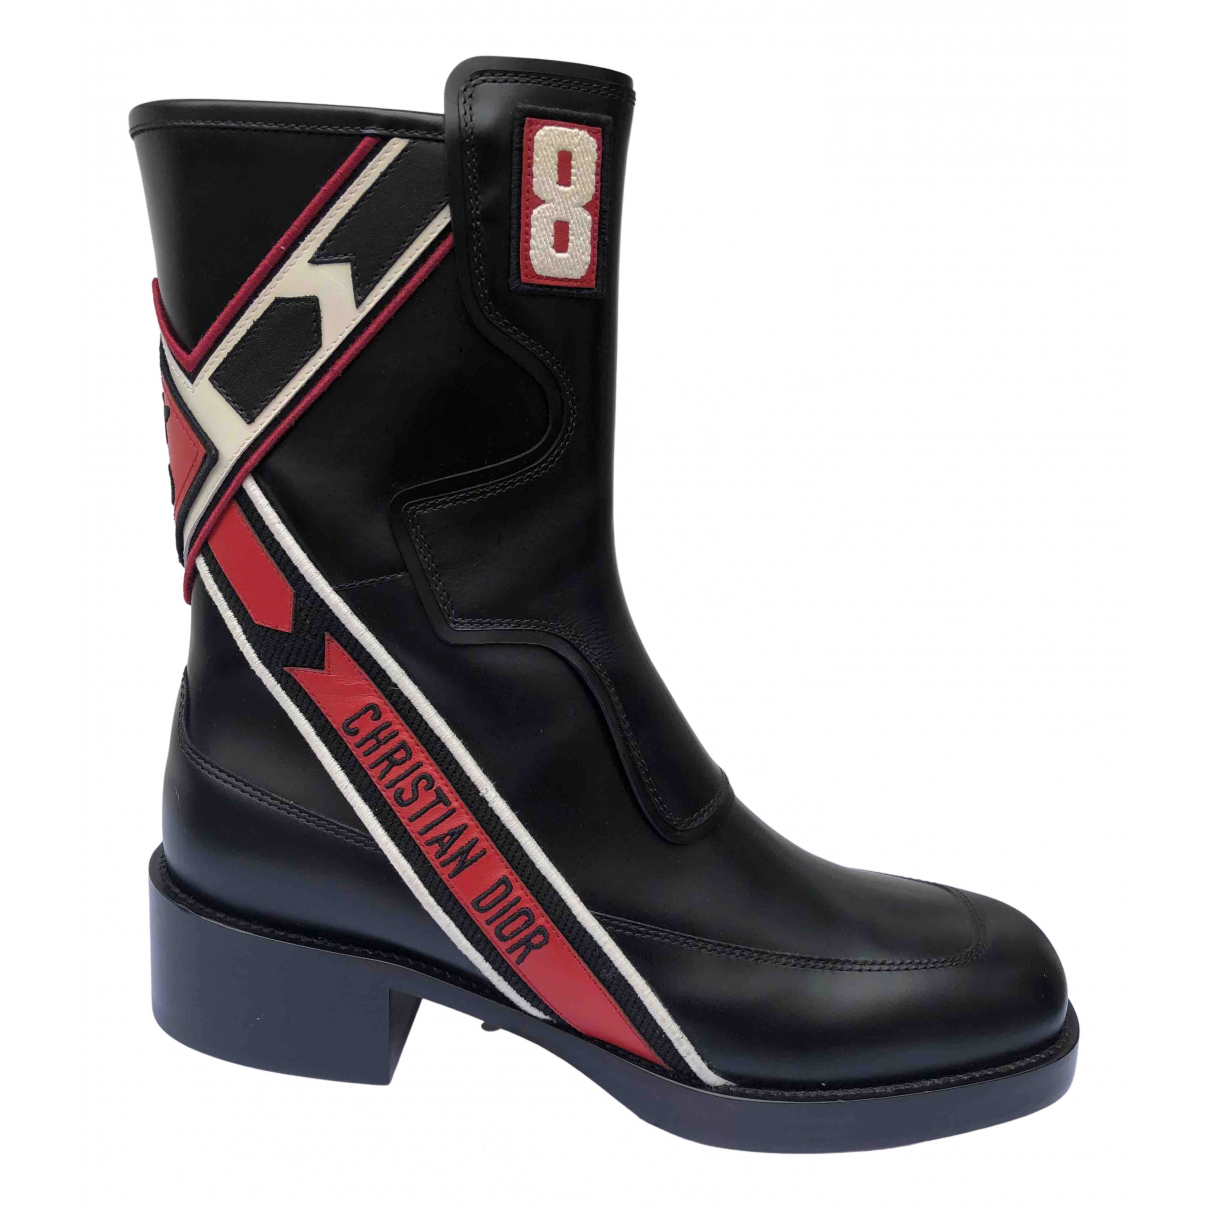 Dior - Boots Diorider pour femme en cuir - multicolore